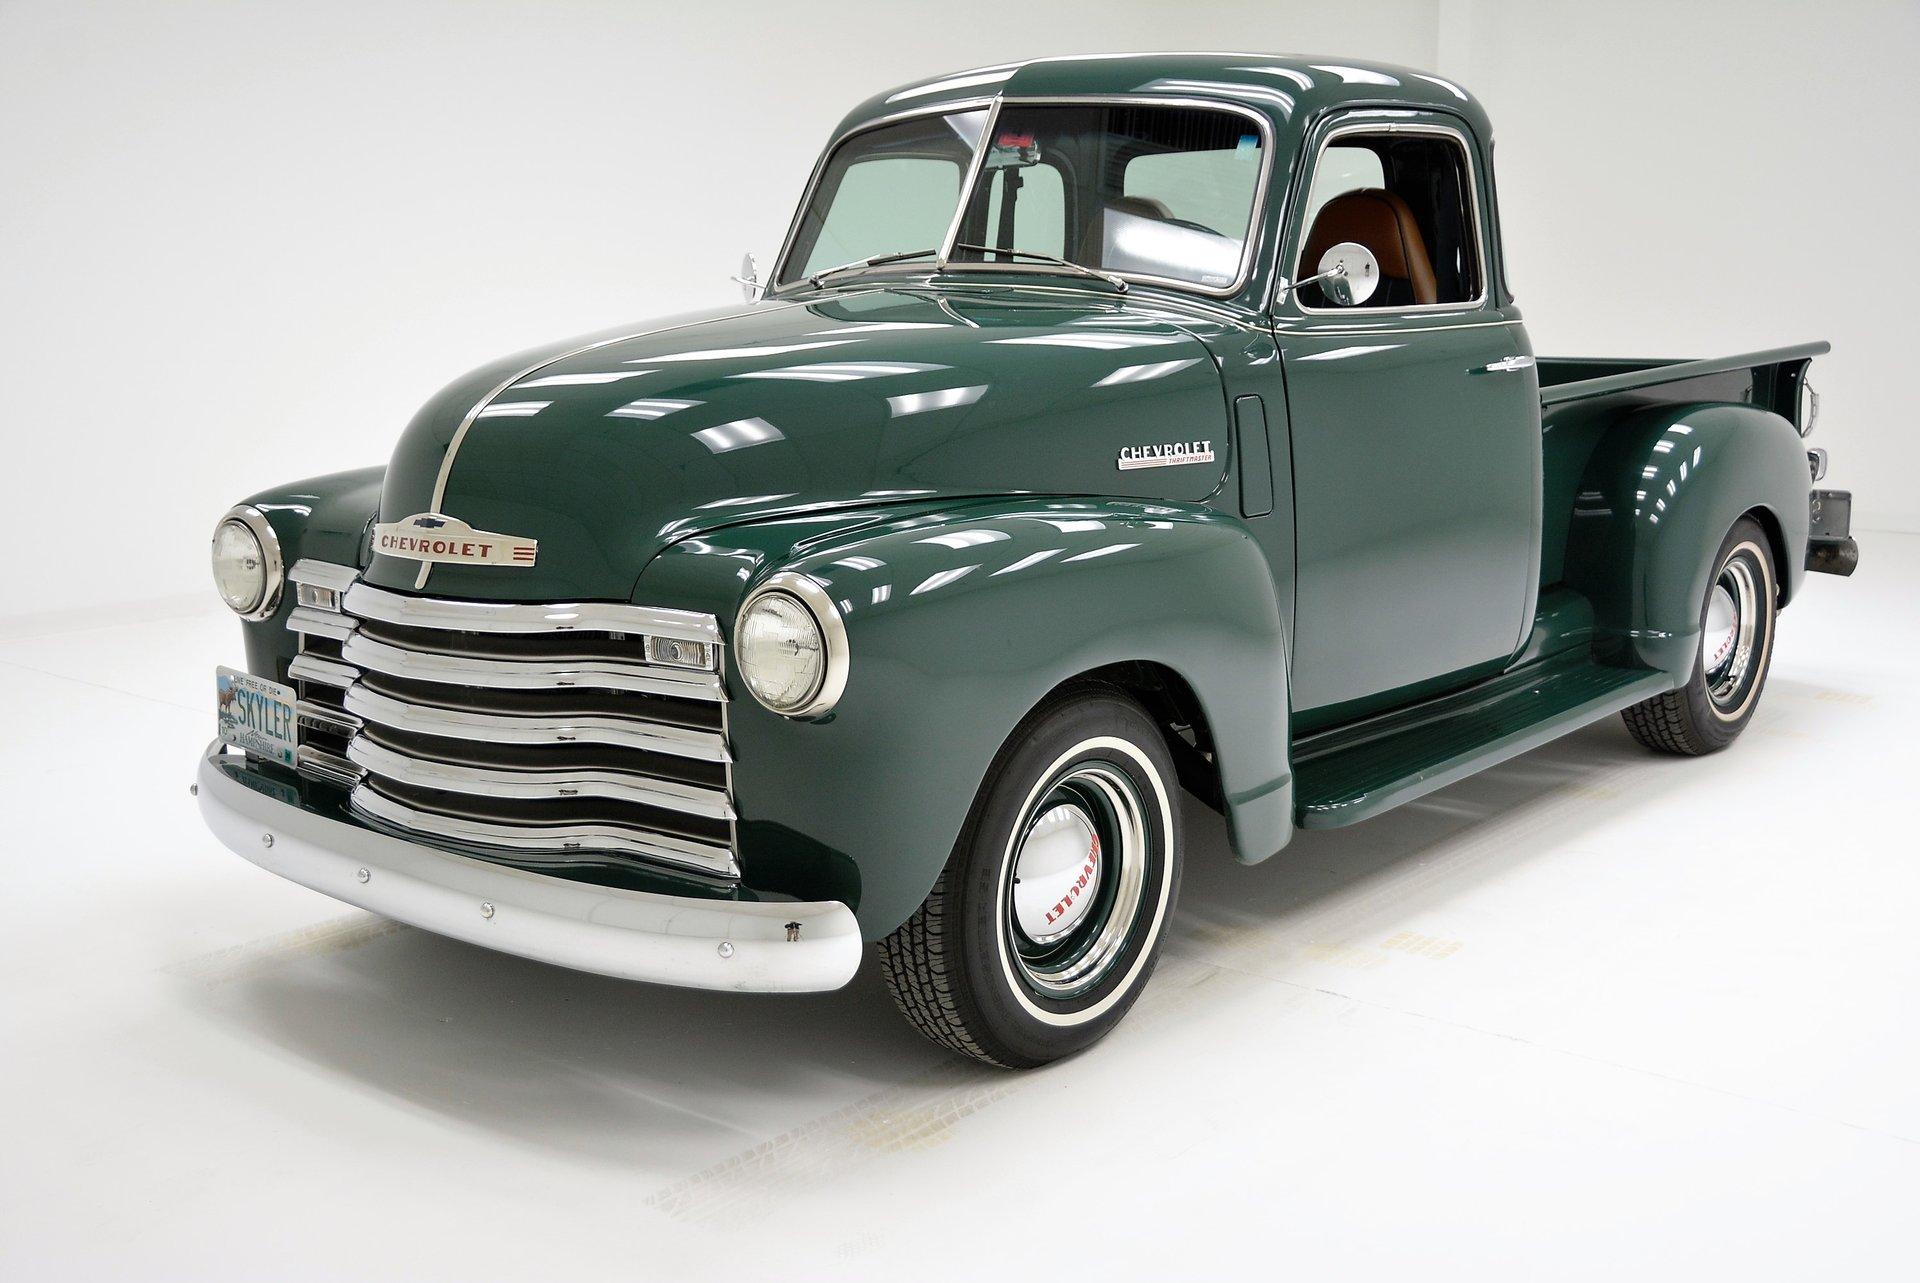 chevrolet 1948 Pickup